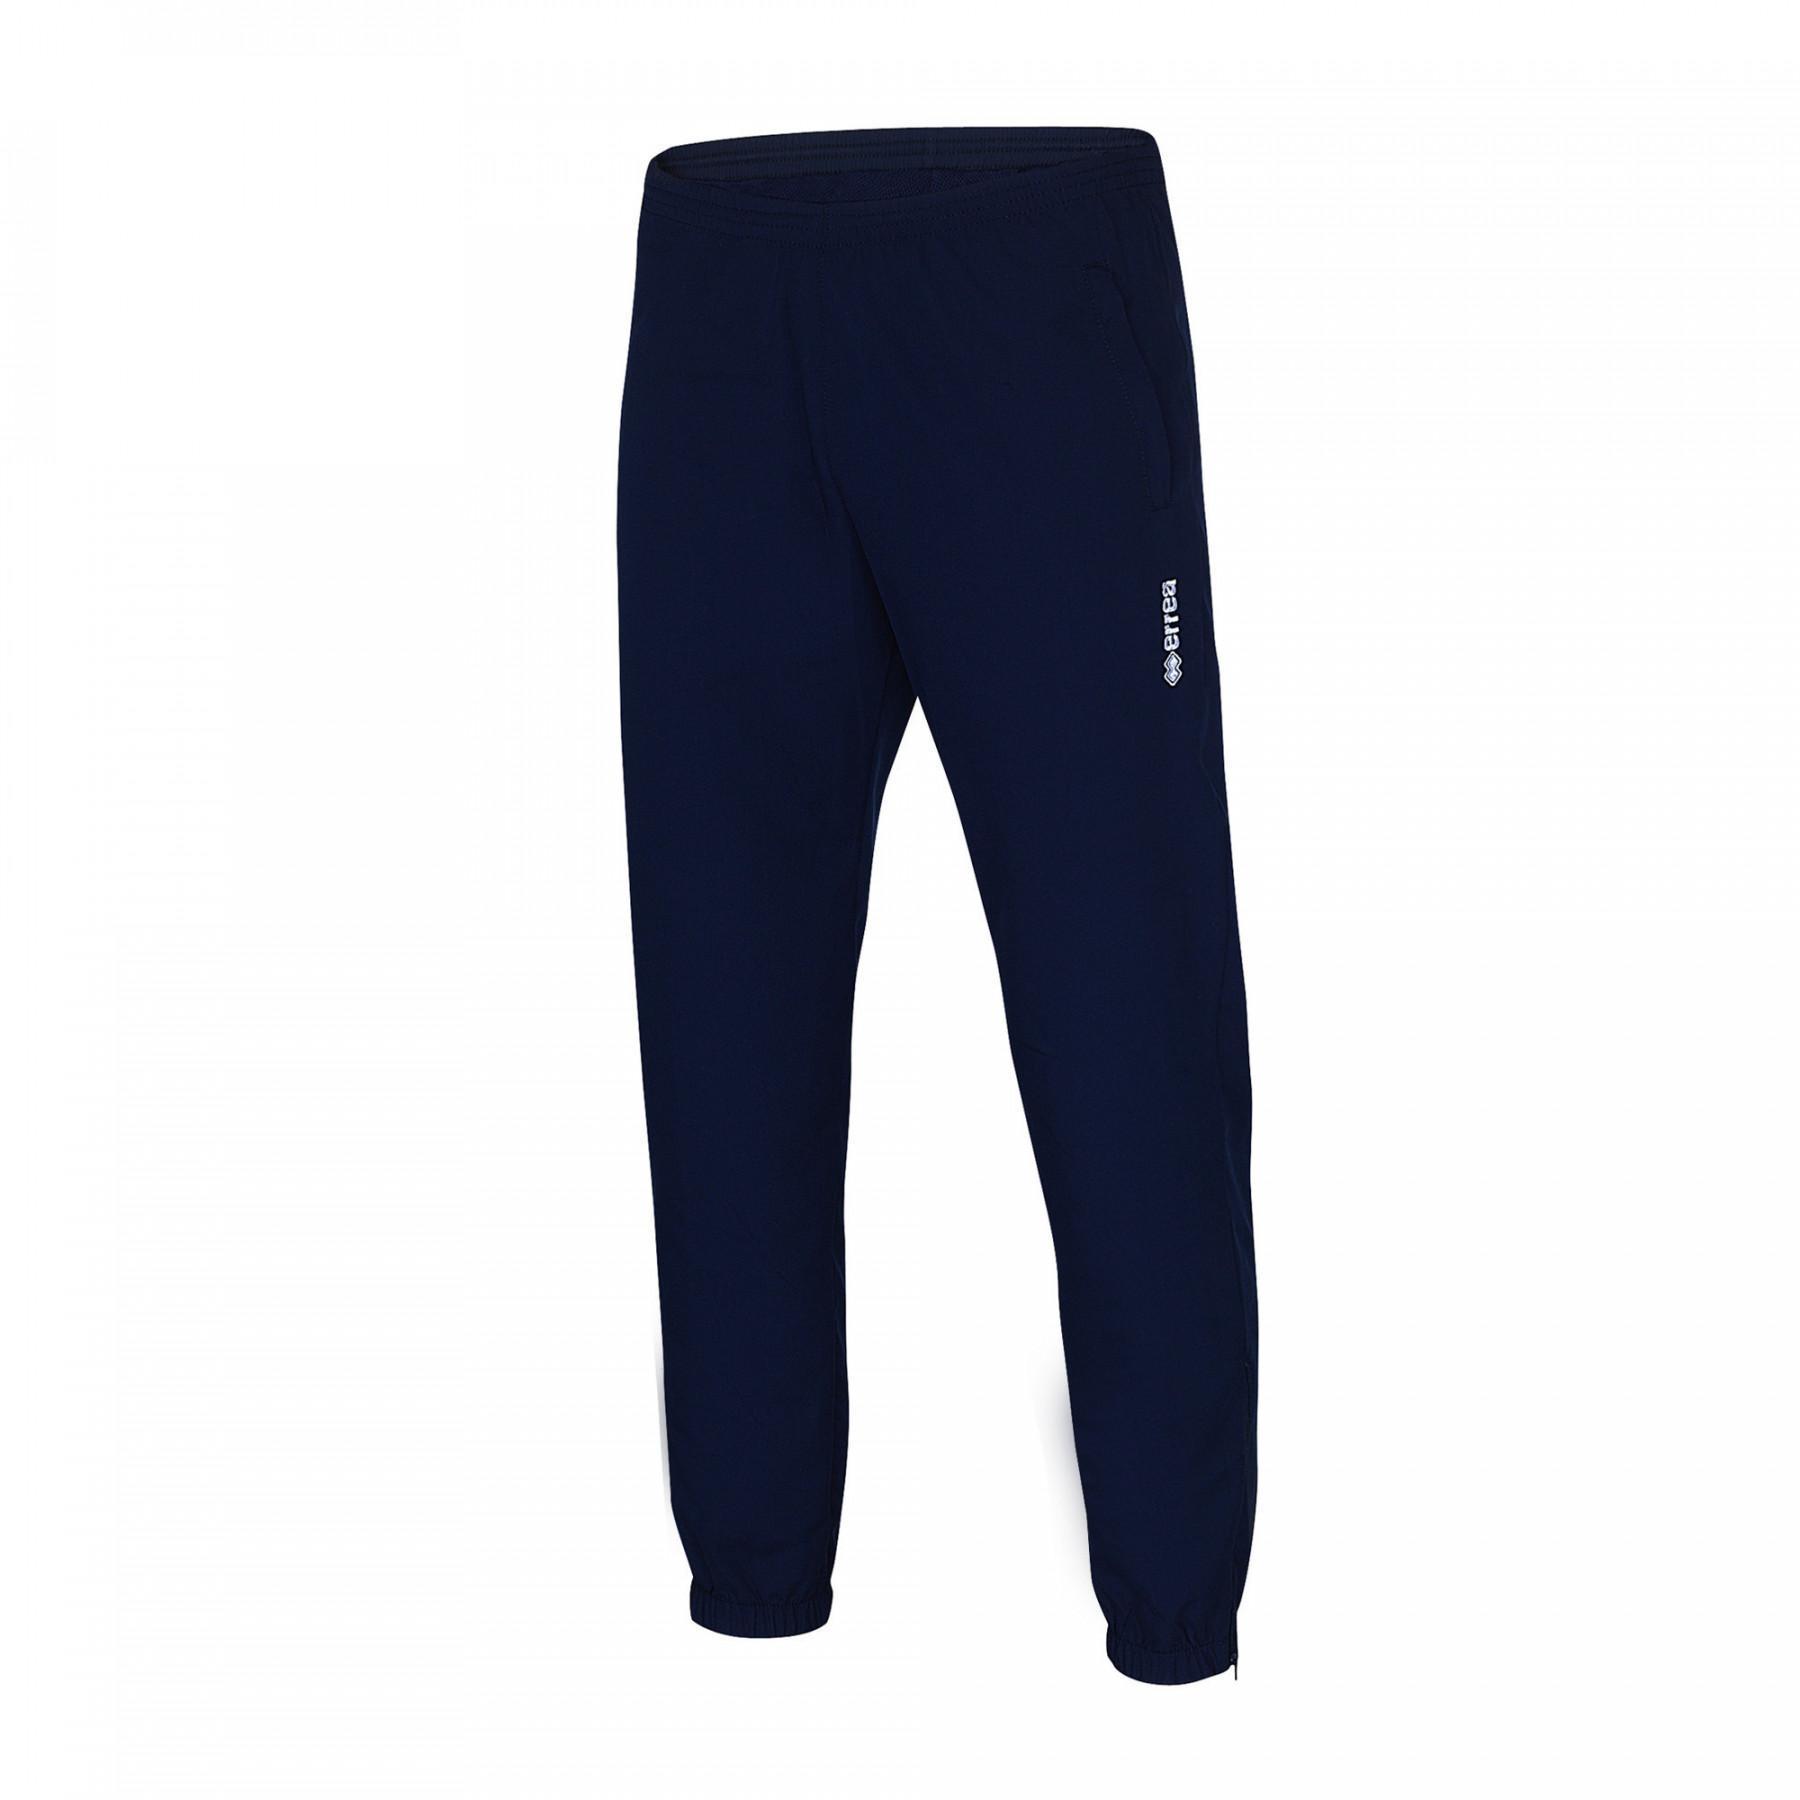 Children's trousers Errea lima